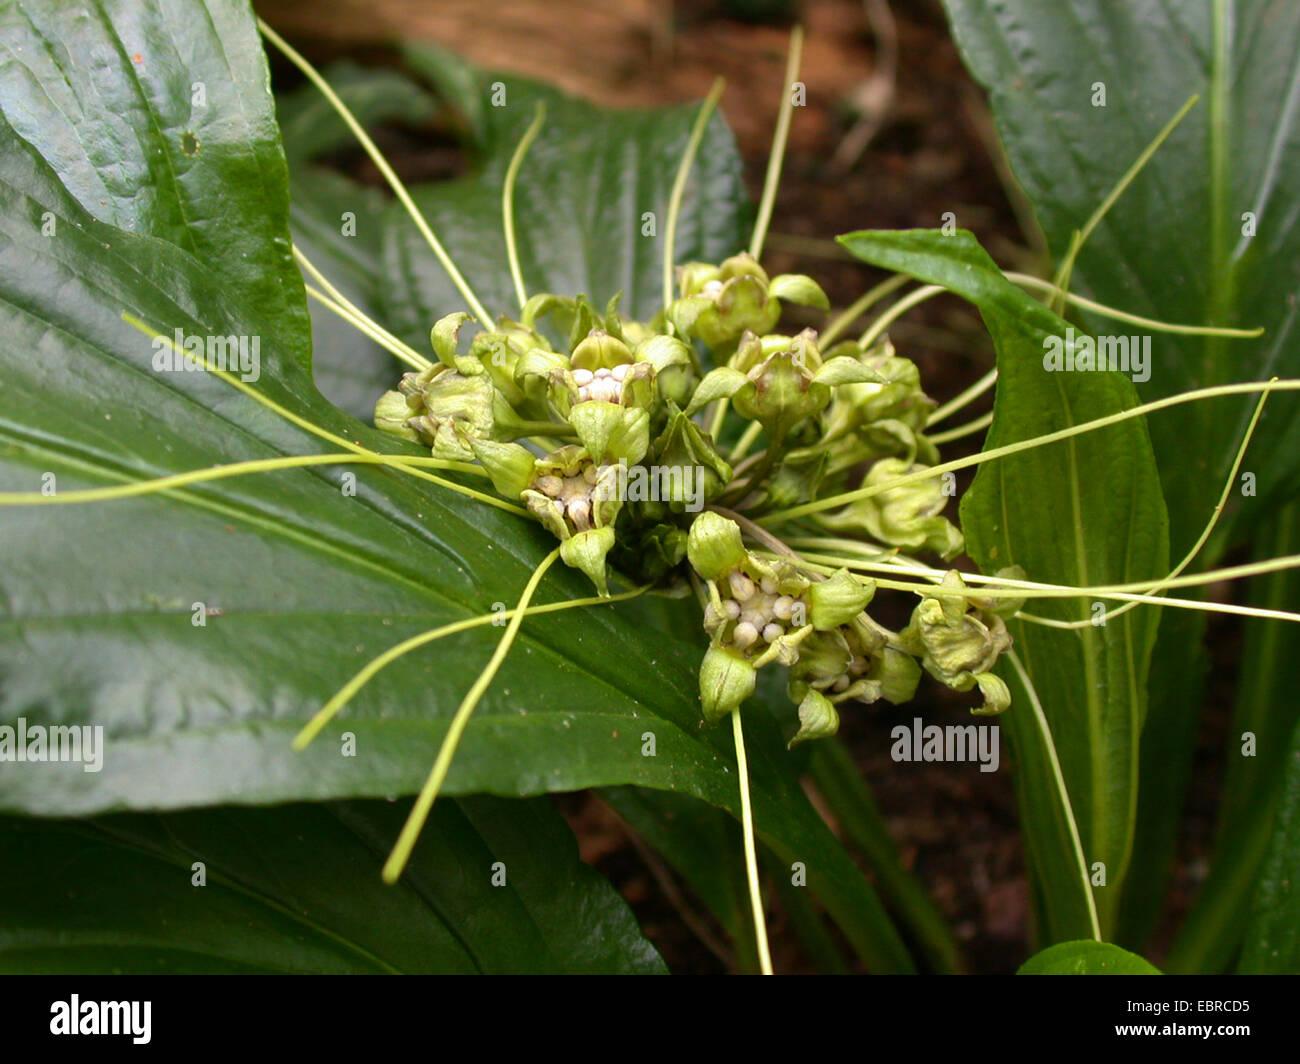 bat plant (Tacca plantaginea), flowers - Stock Image